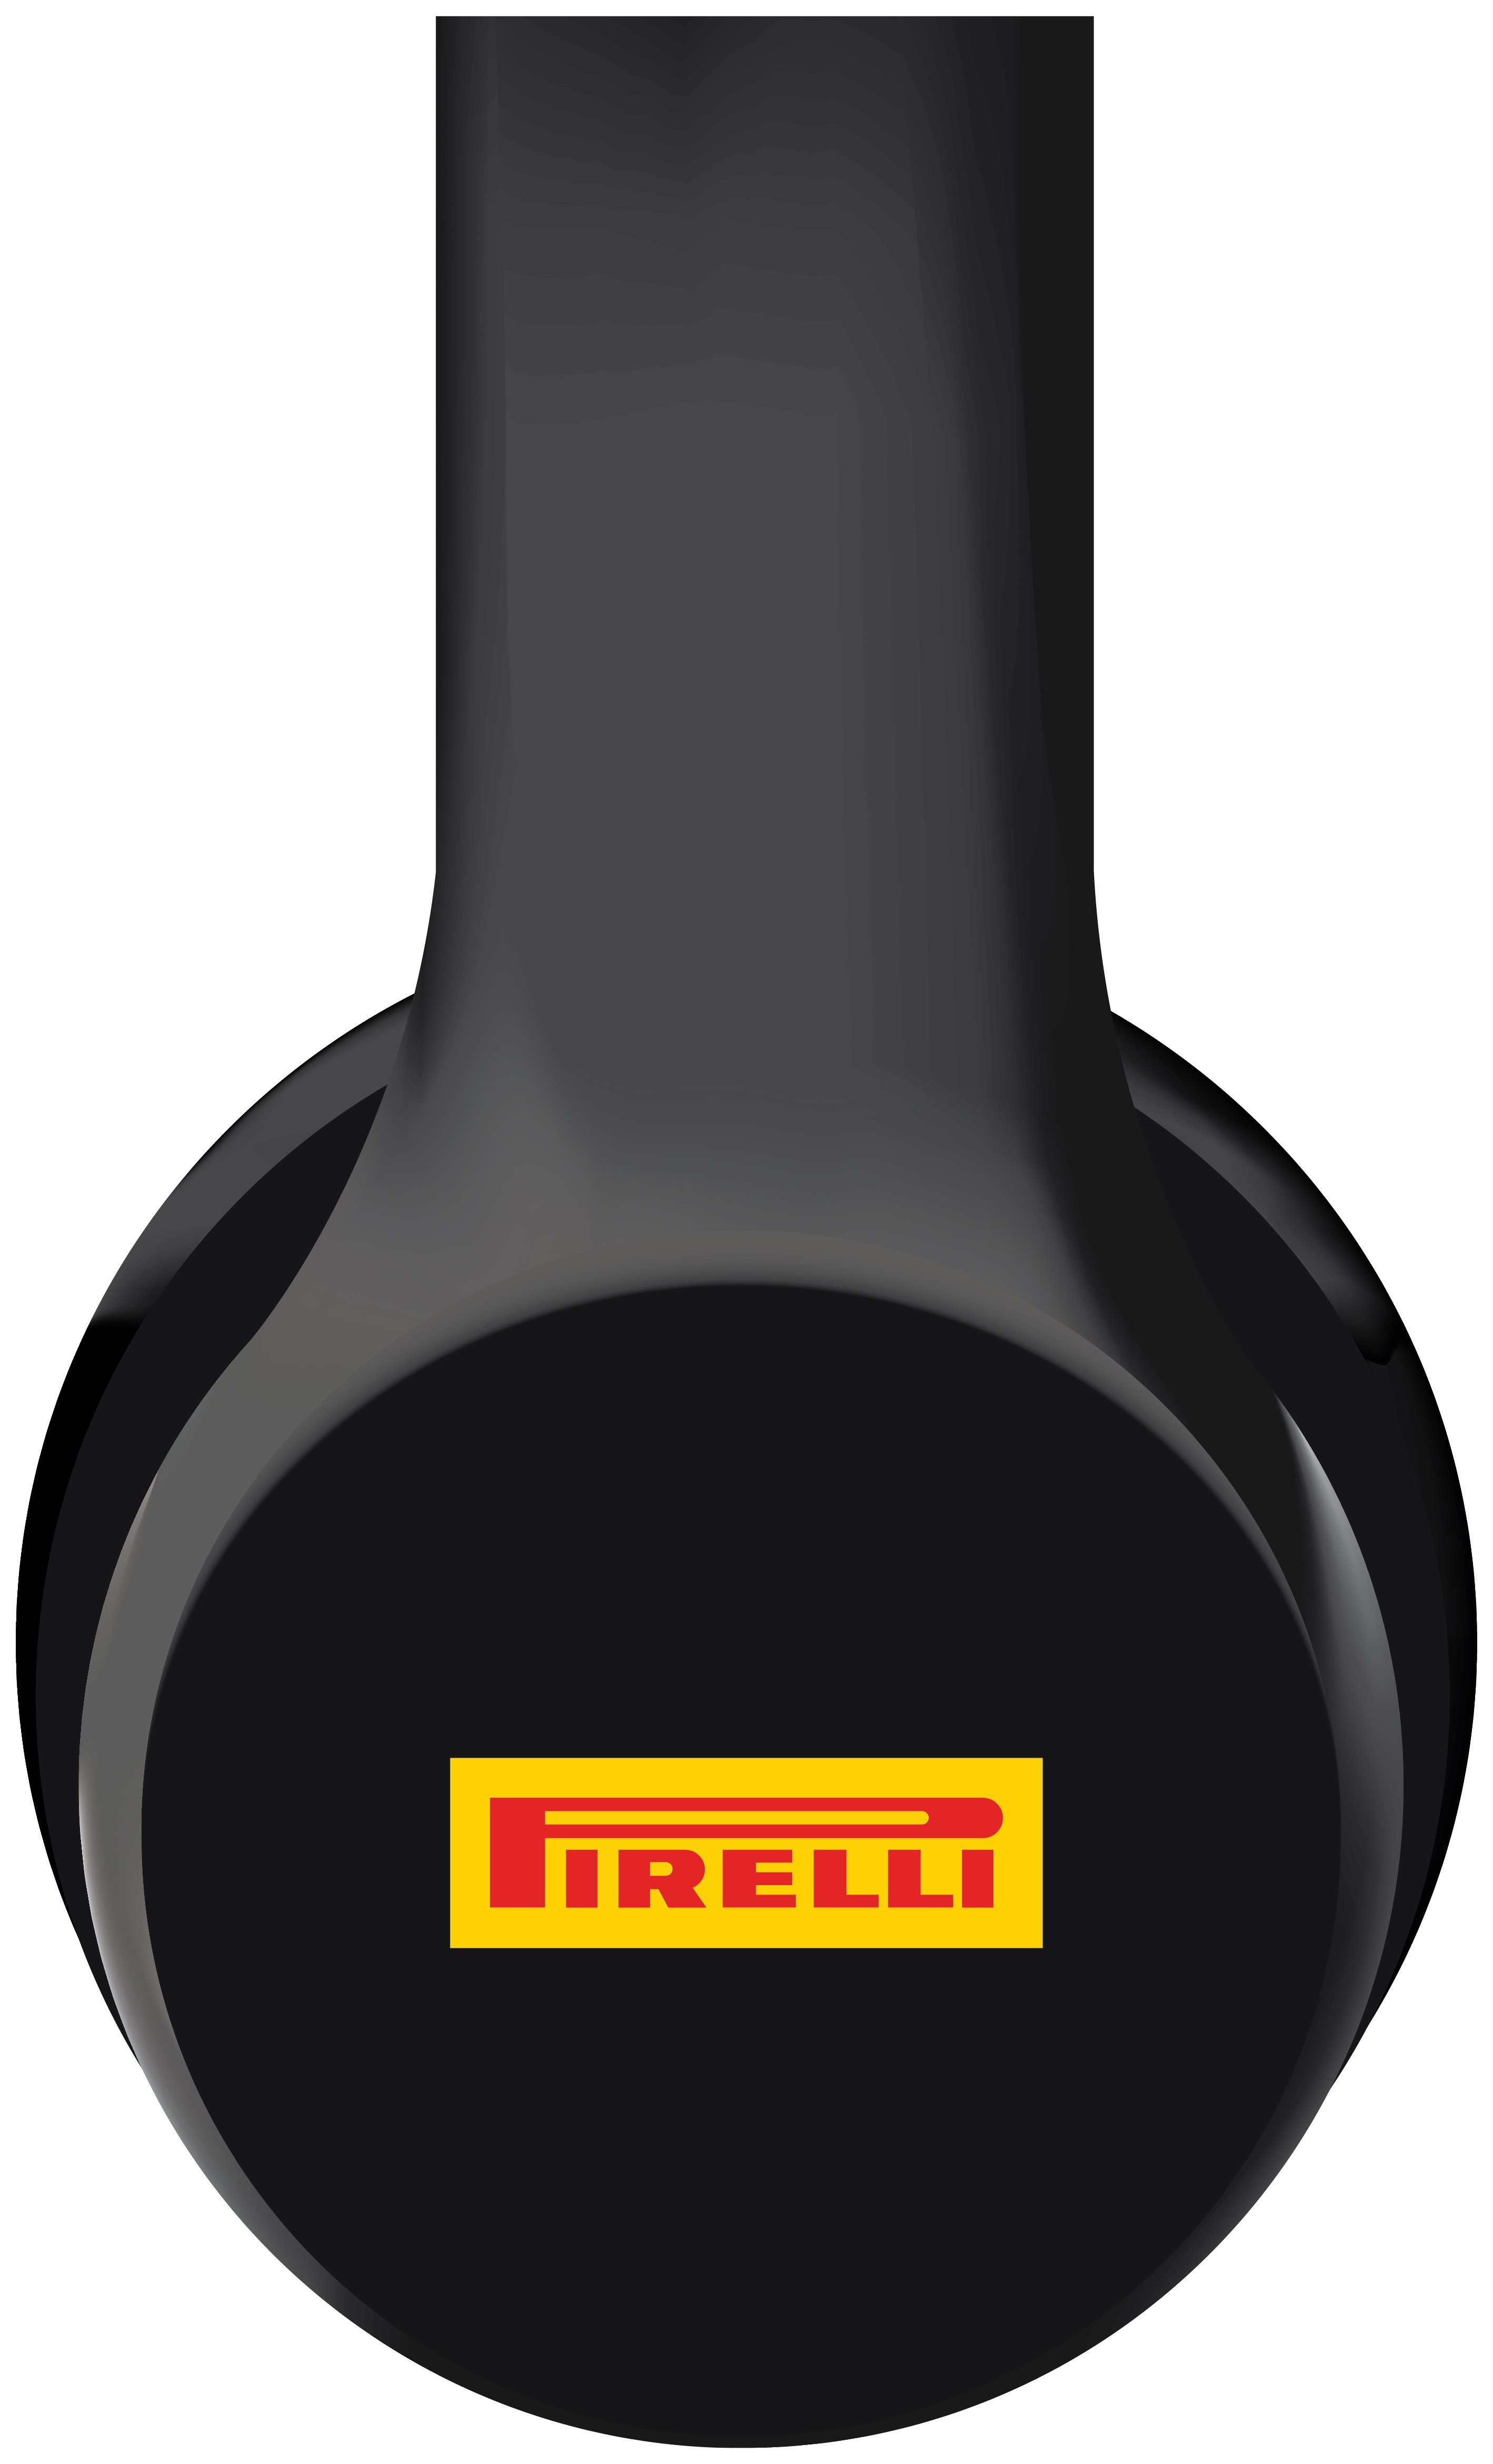 Pirelli Pirelli Scorpion On Ear Headphones - Black.